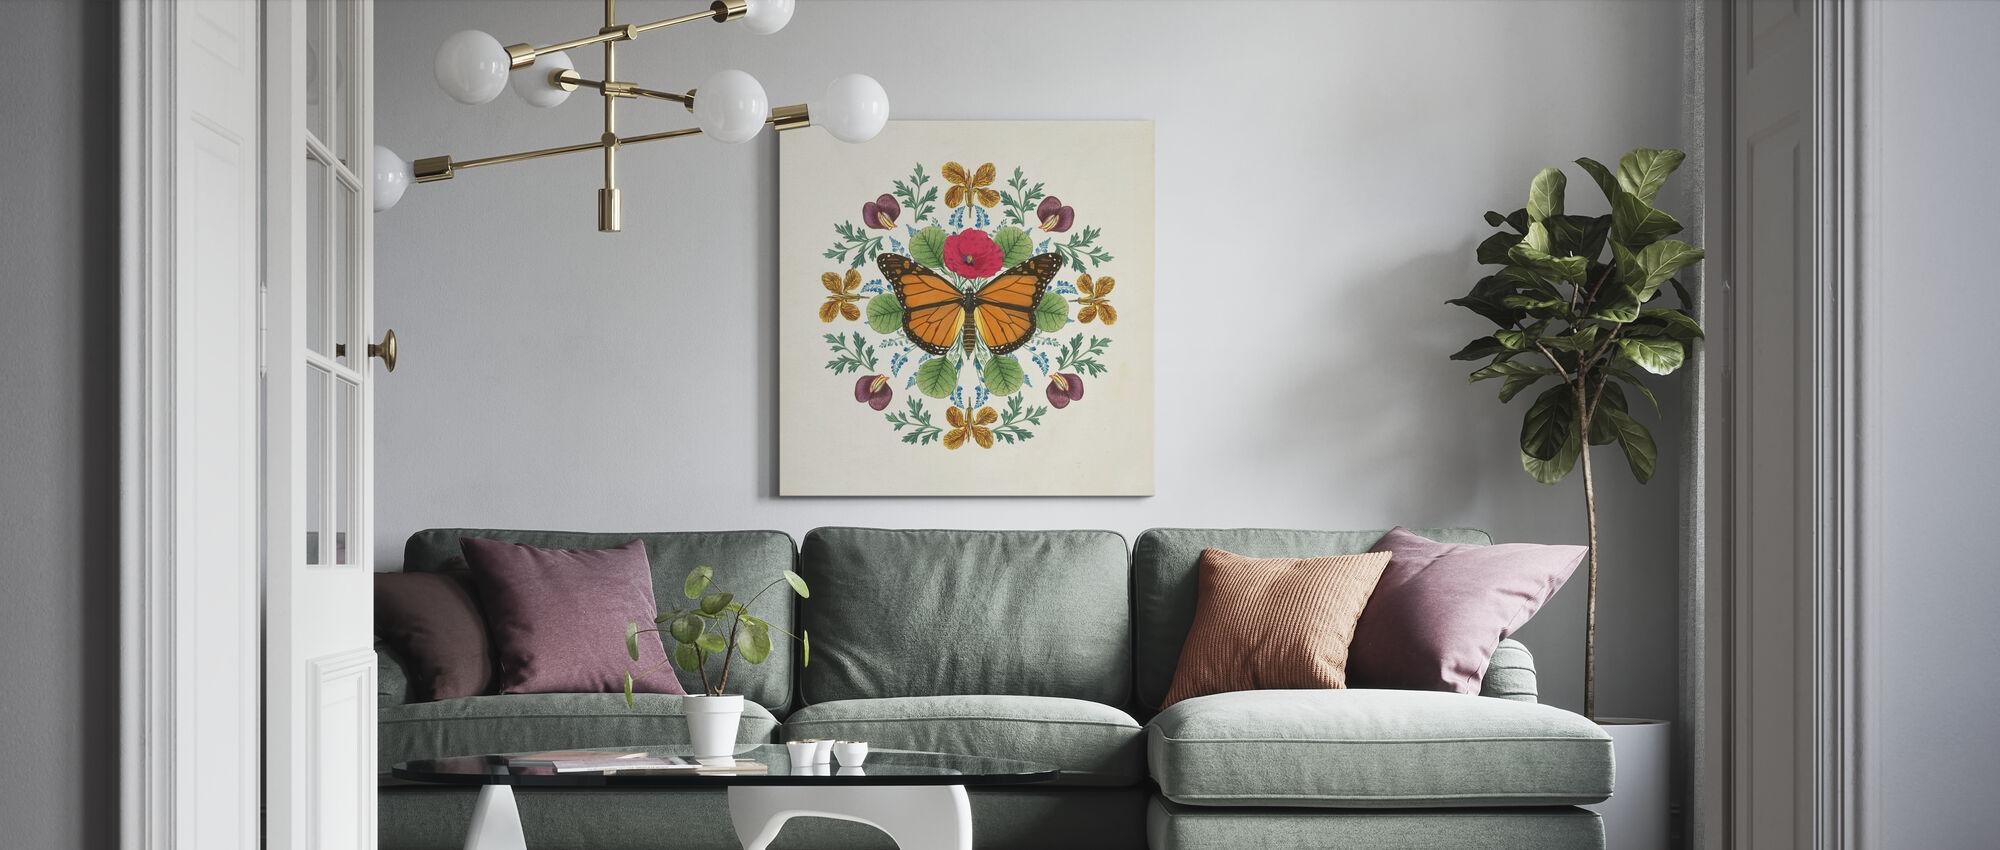 Butterfly Mandala - Canvas print - Living Room